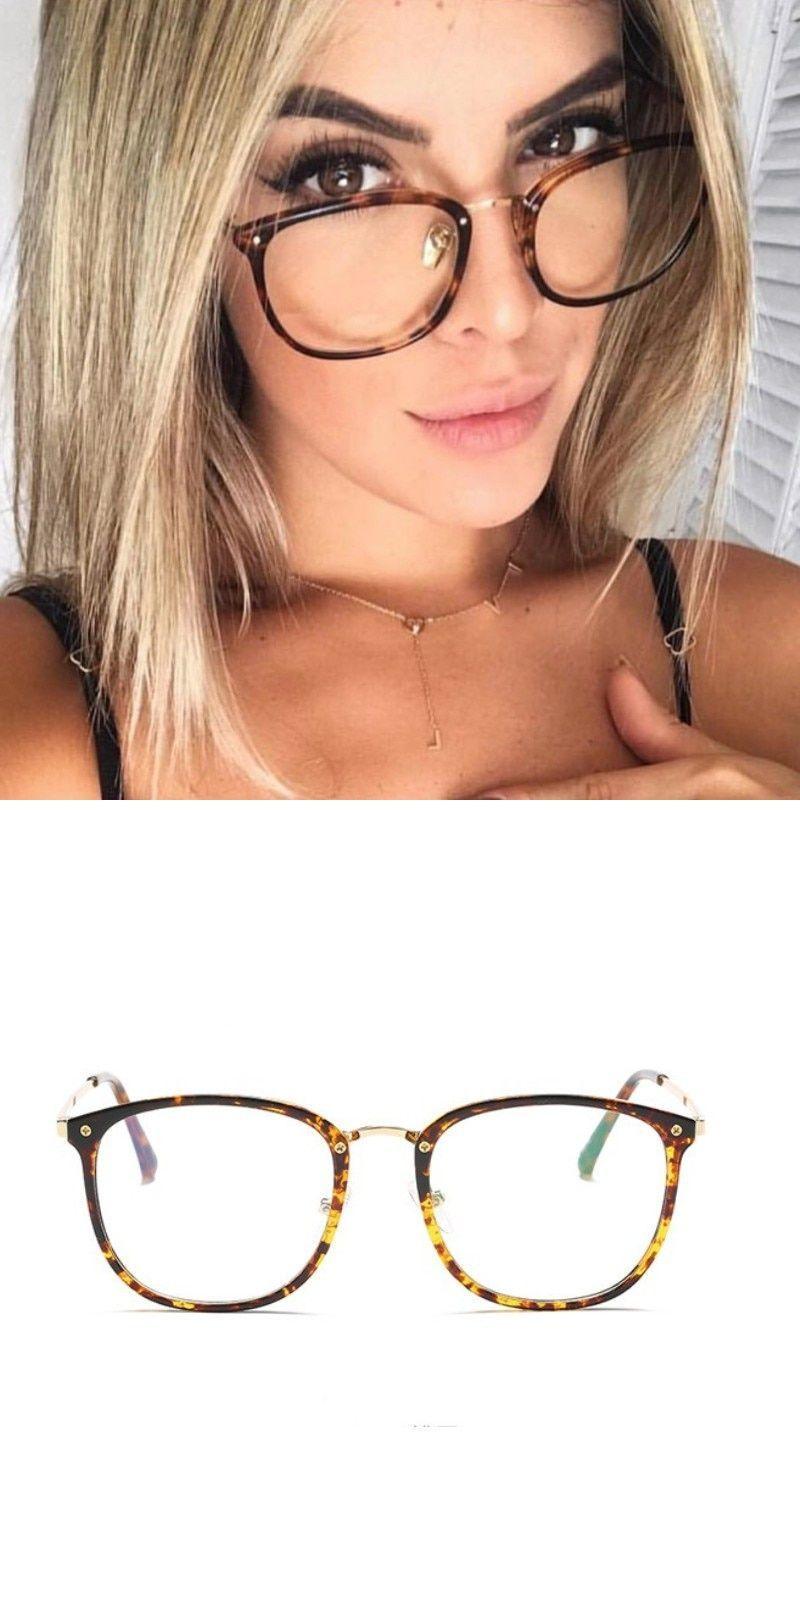 New oculos de grau ultra light tr90 fake eyeglasses frames for women retro  myopia glasses frame classic women s optical frames  frames  eyewear   accessories ... 18242159b3